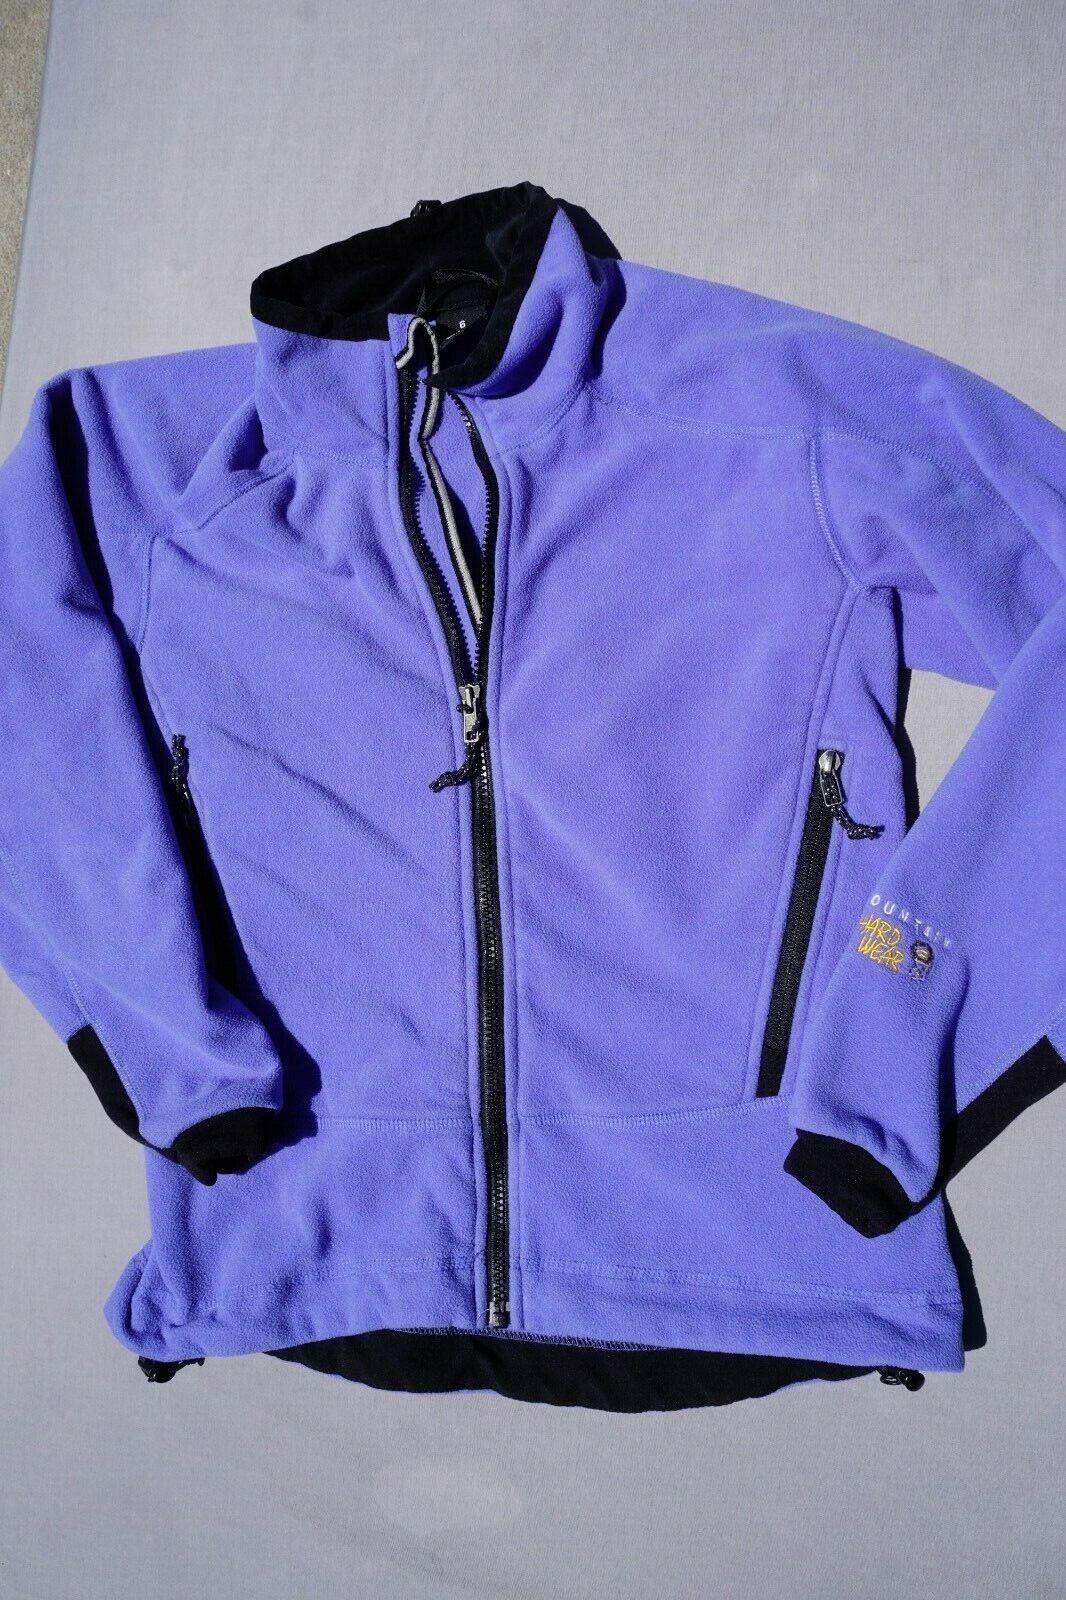 Mountain Hardware Polartec Fleece Full Zip Sweatshirt With Pockets Women's Sz 6